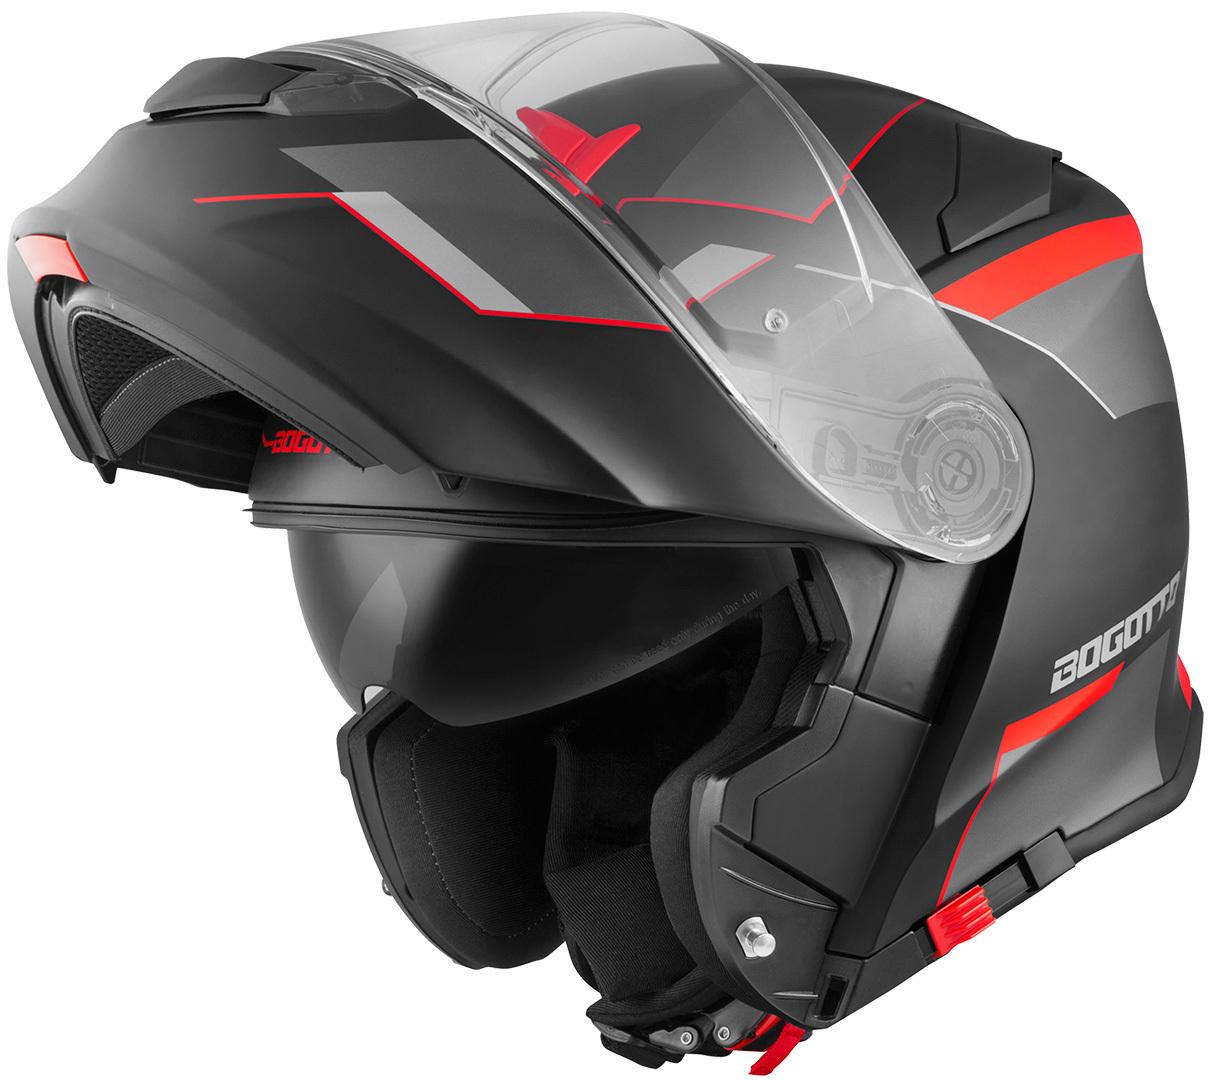 Bogotto V271 Delta Klapphelm, schwarz-rot, Größe XS, schwarz-rot, Größe XS